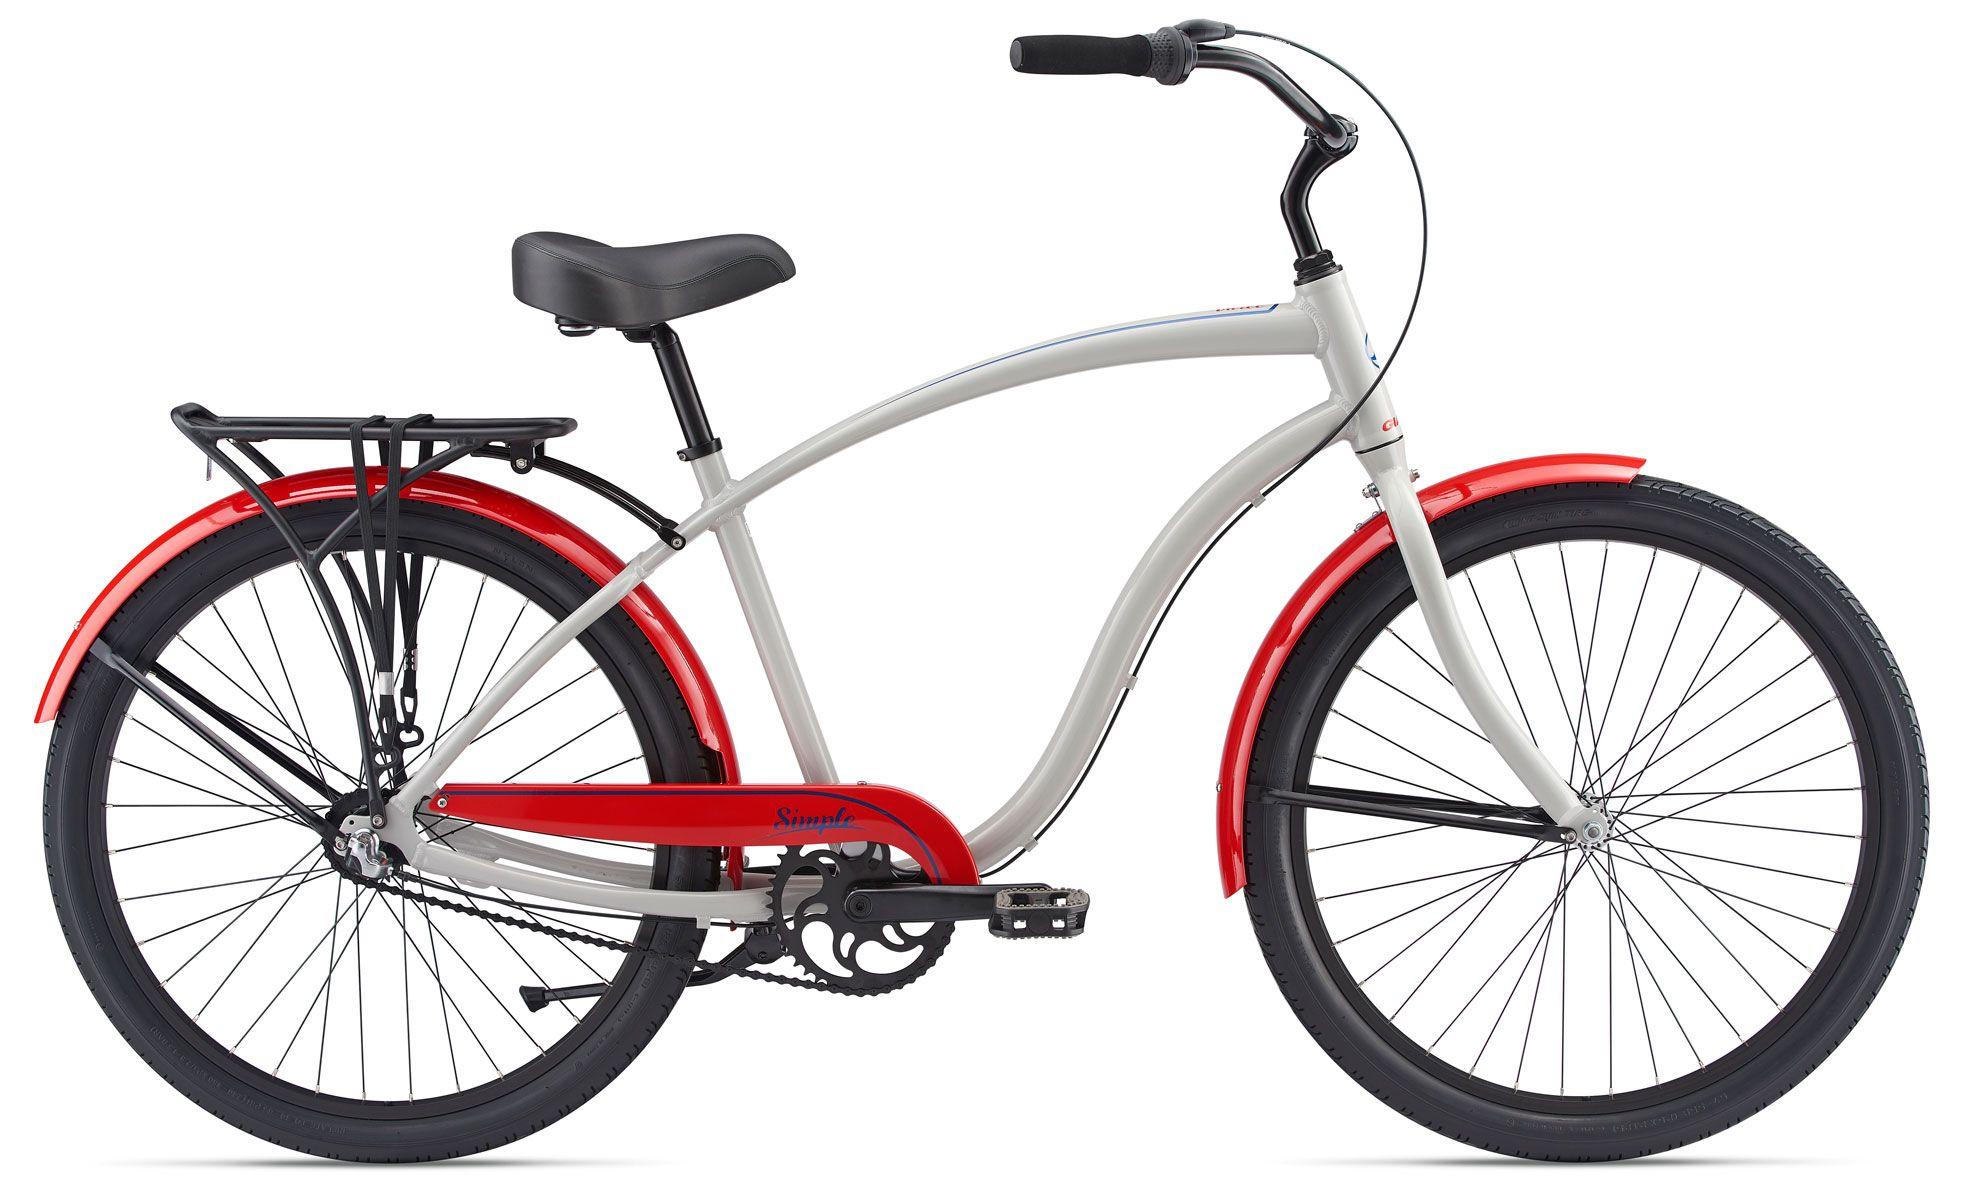 Велосипед Giant Simple Three 2018 велосипед giant tcr advanced 2 compact 2013